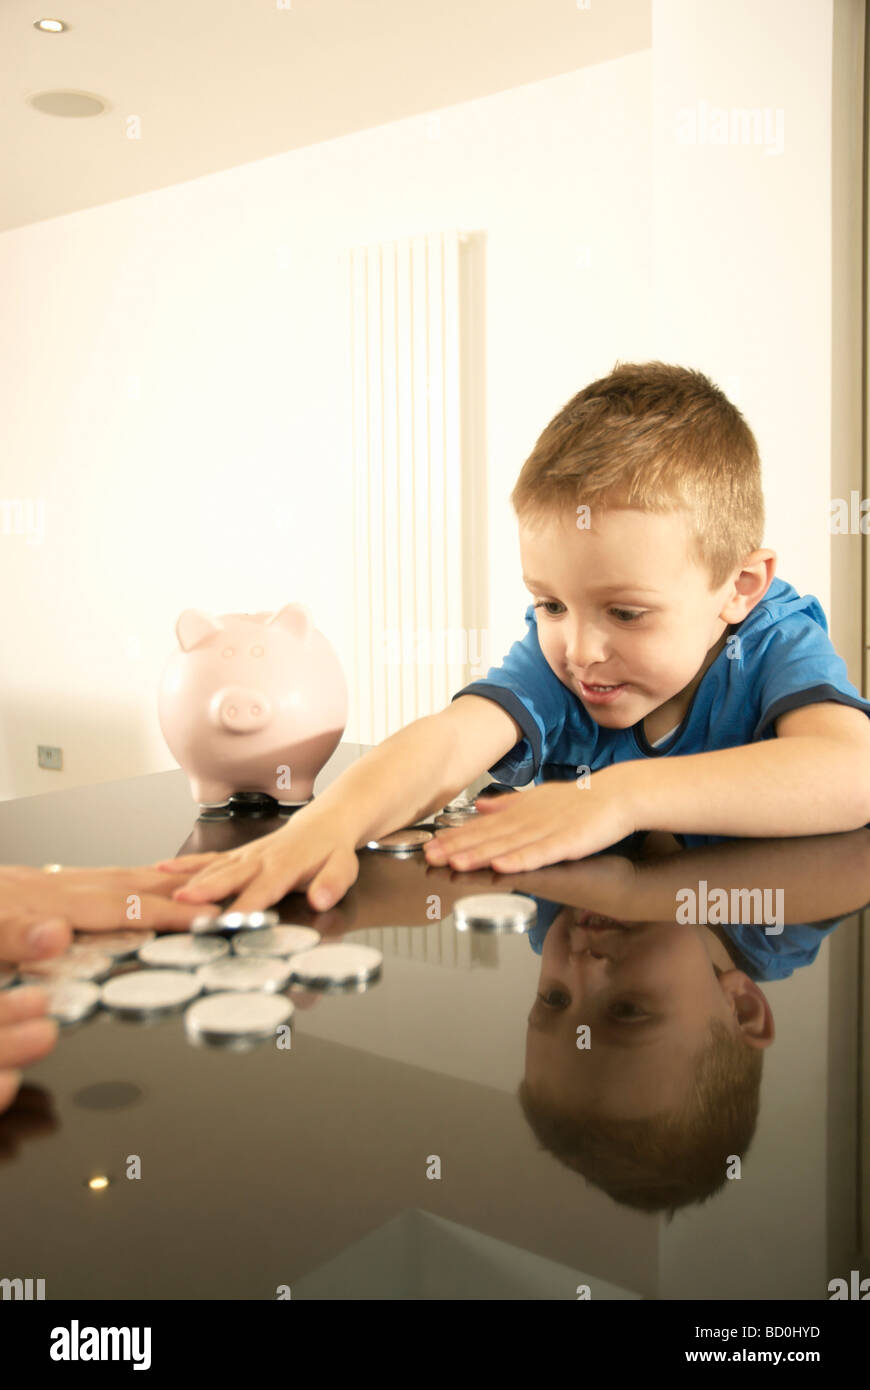 boy grabbing money Stock Photo